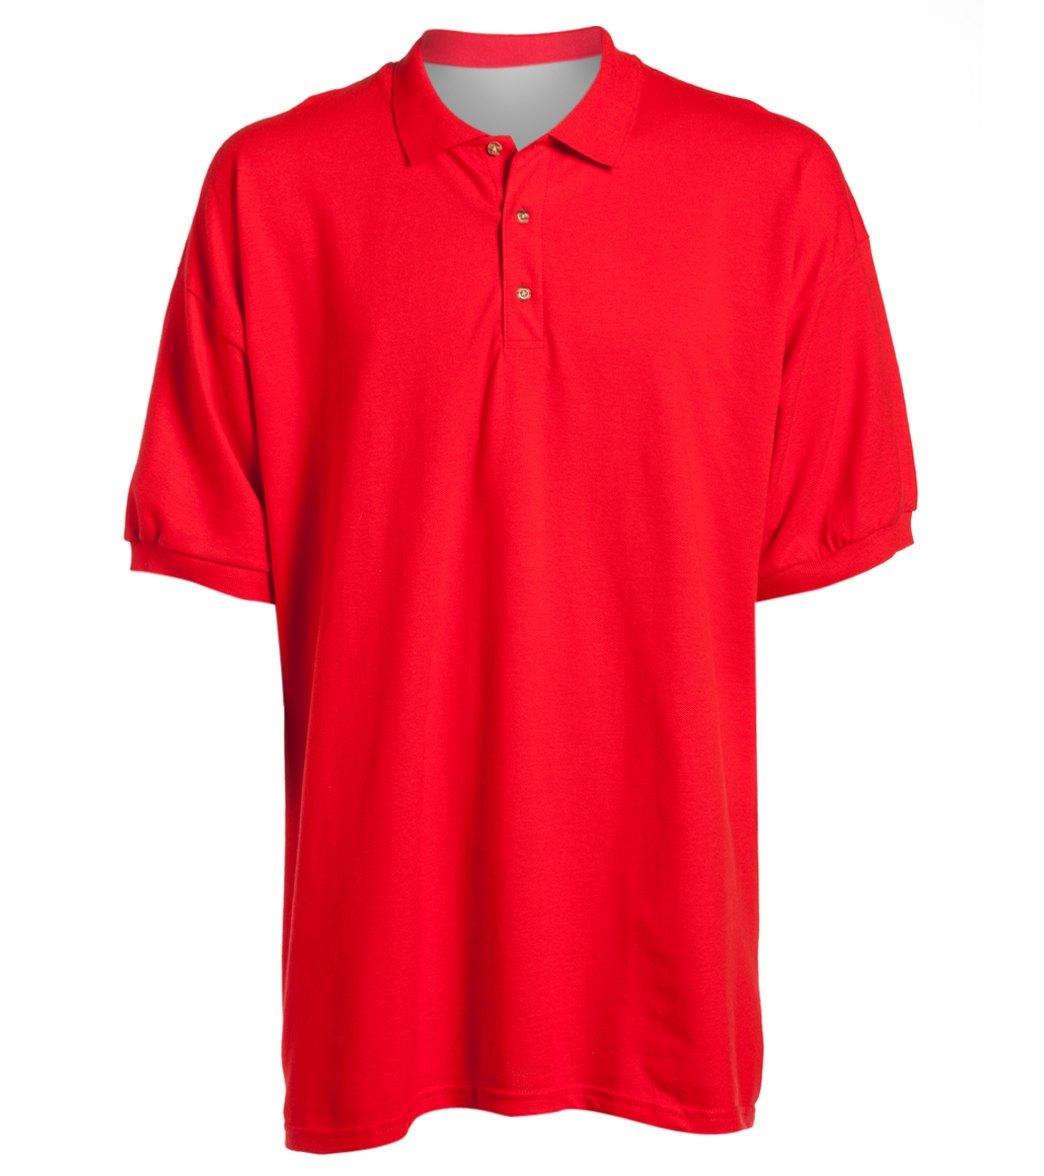 Swimoutlet Custom Mens Ultra Cotton Polo Shirt At Swimoutlet